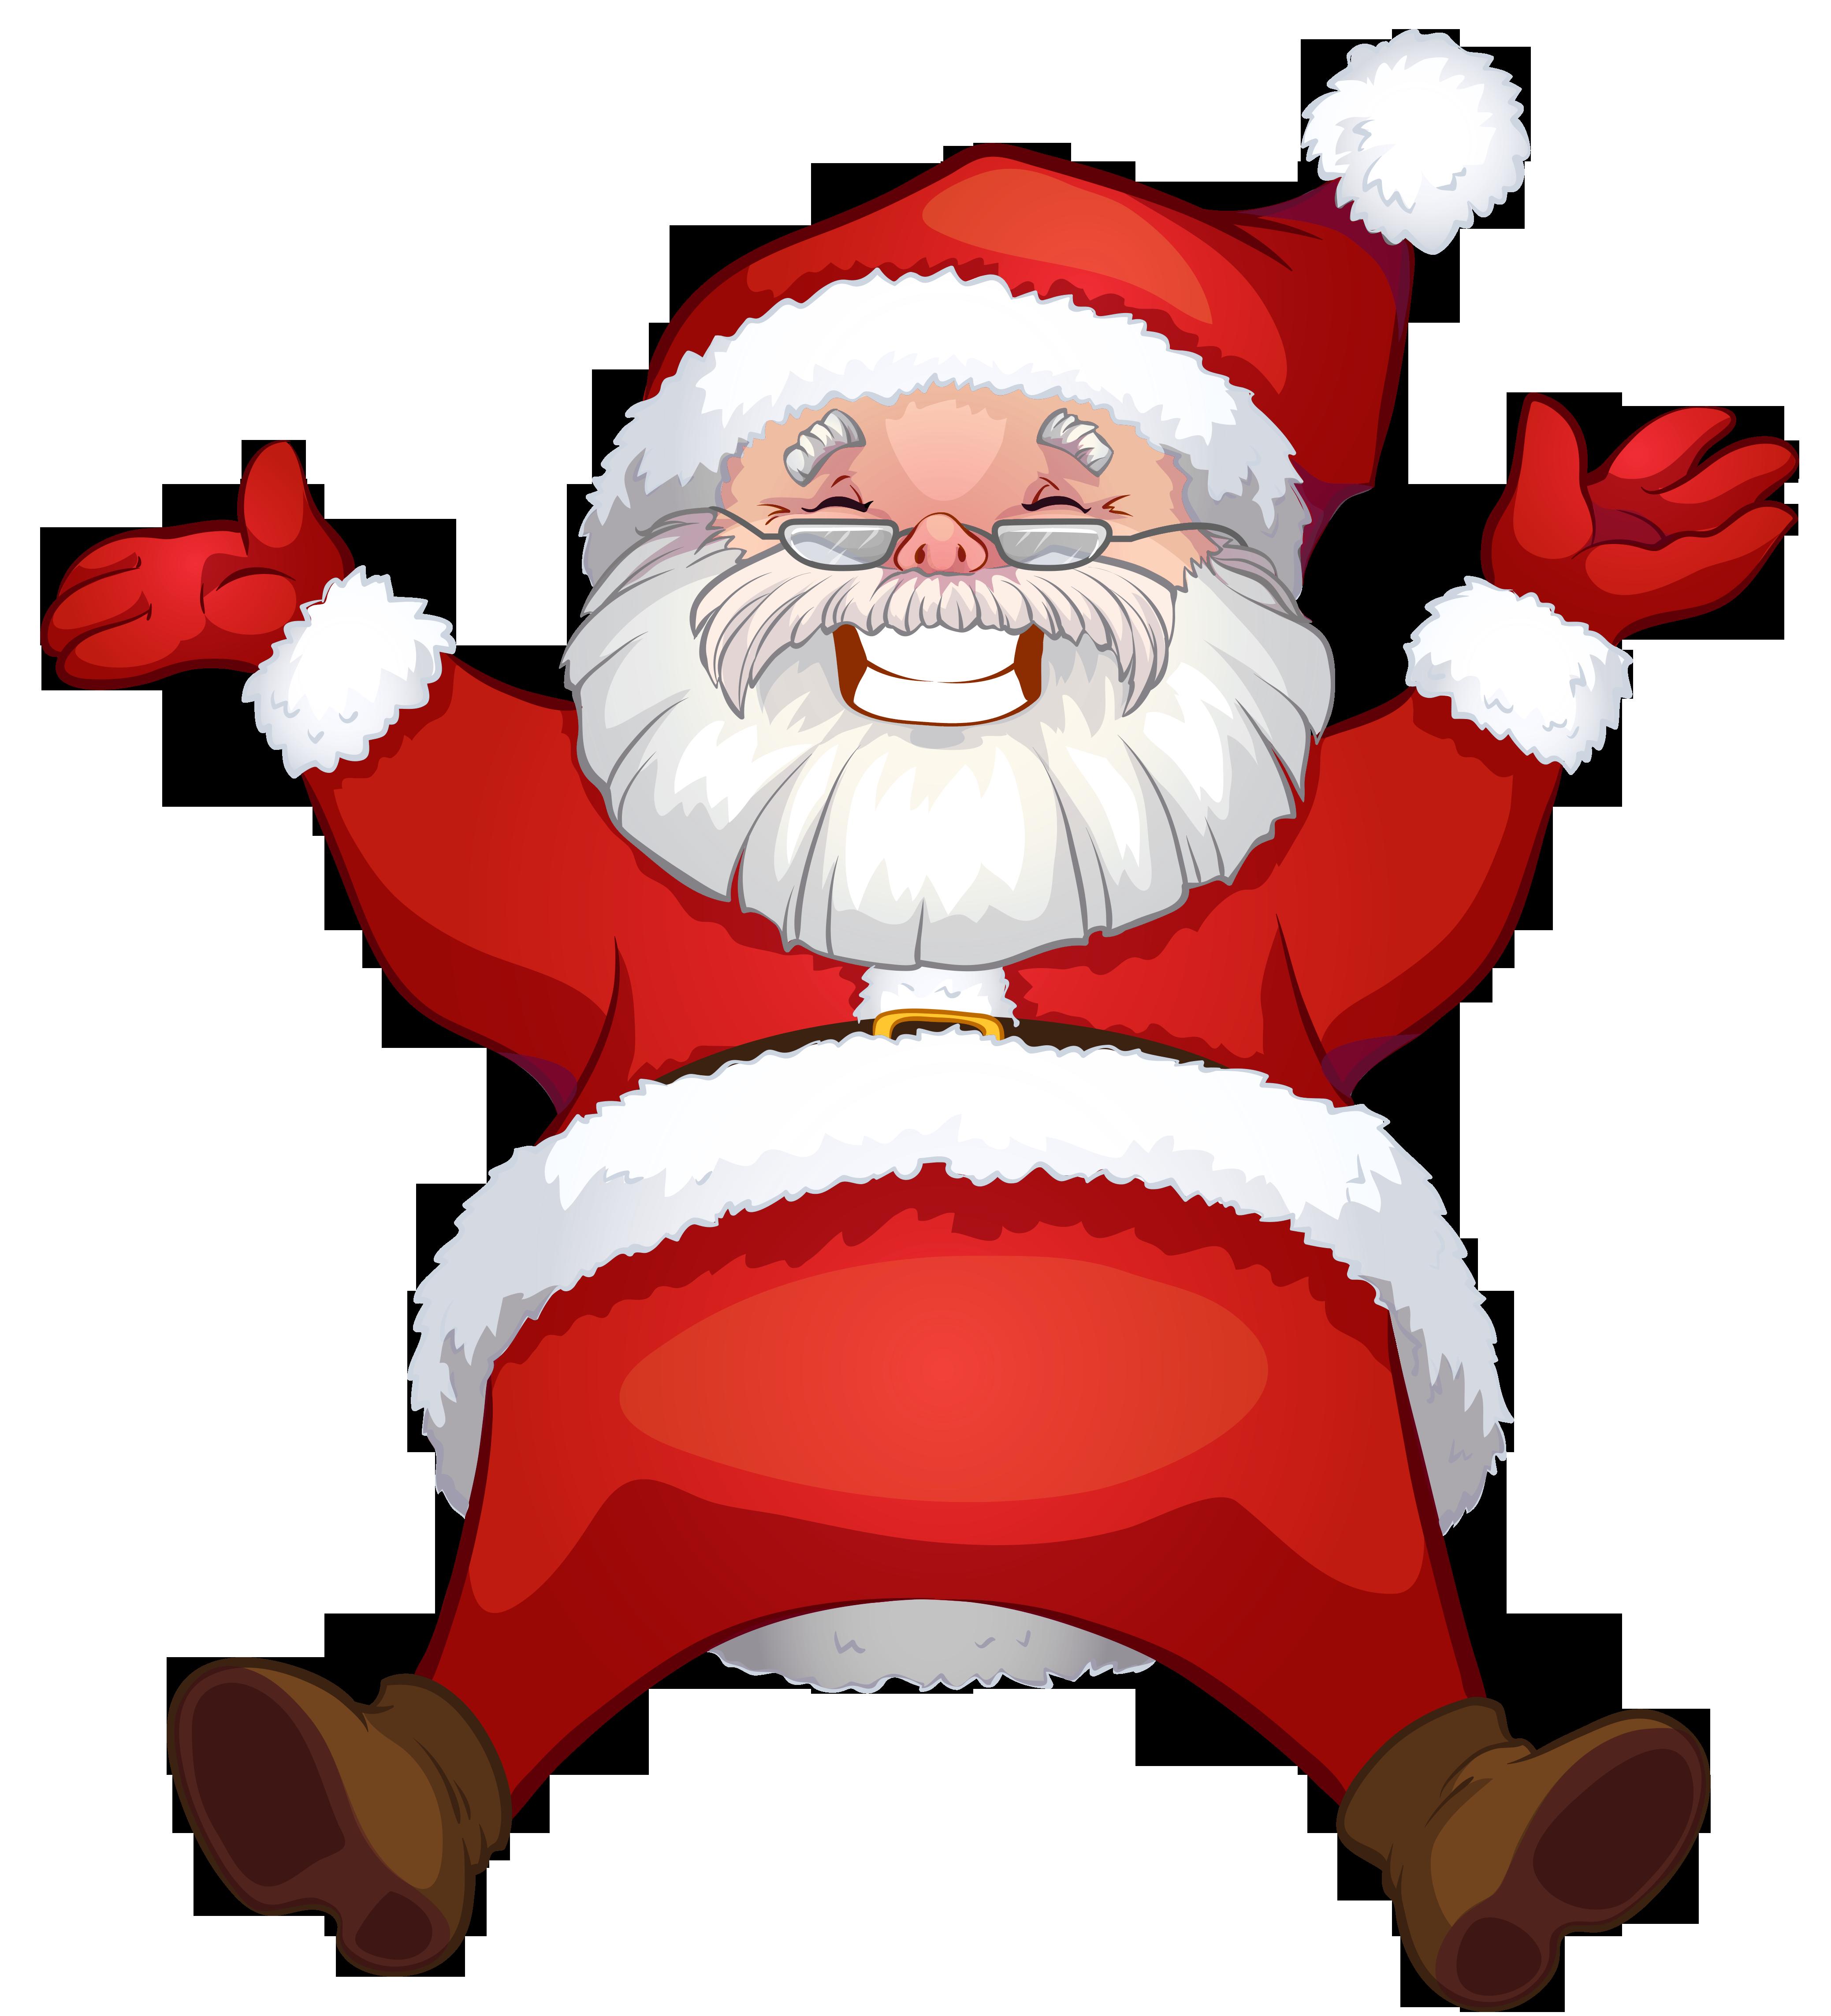 Transparent Santa Claus Clipart (With images) Disney